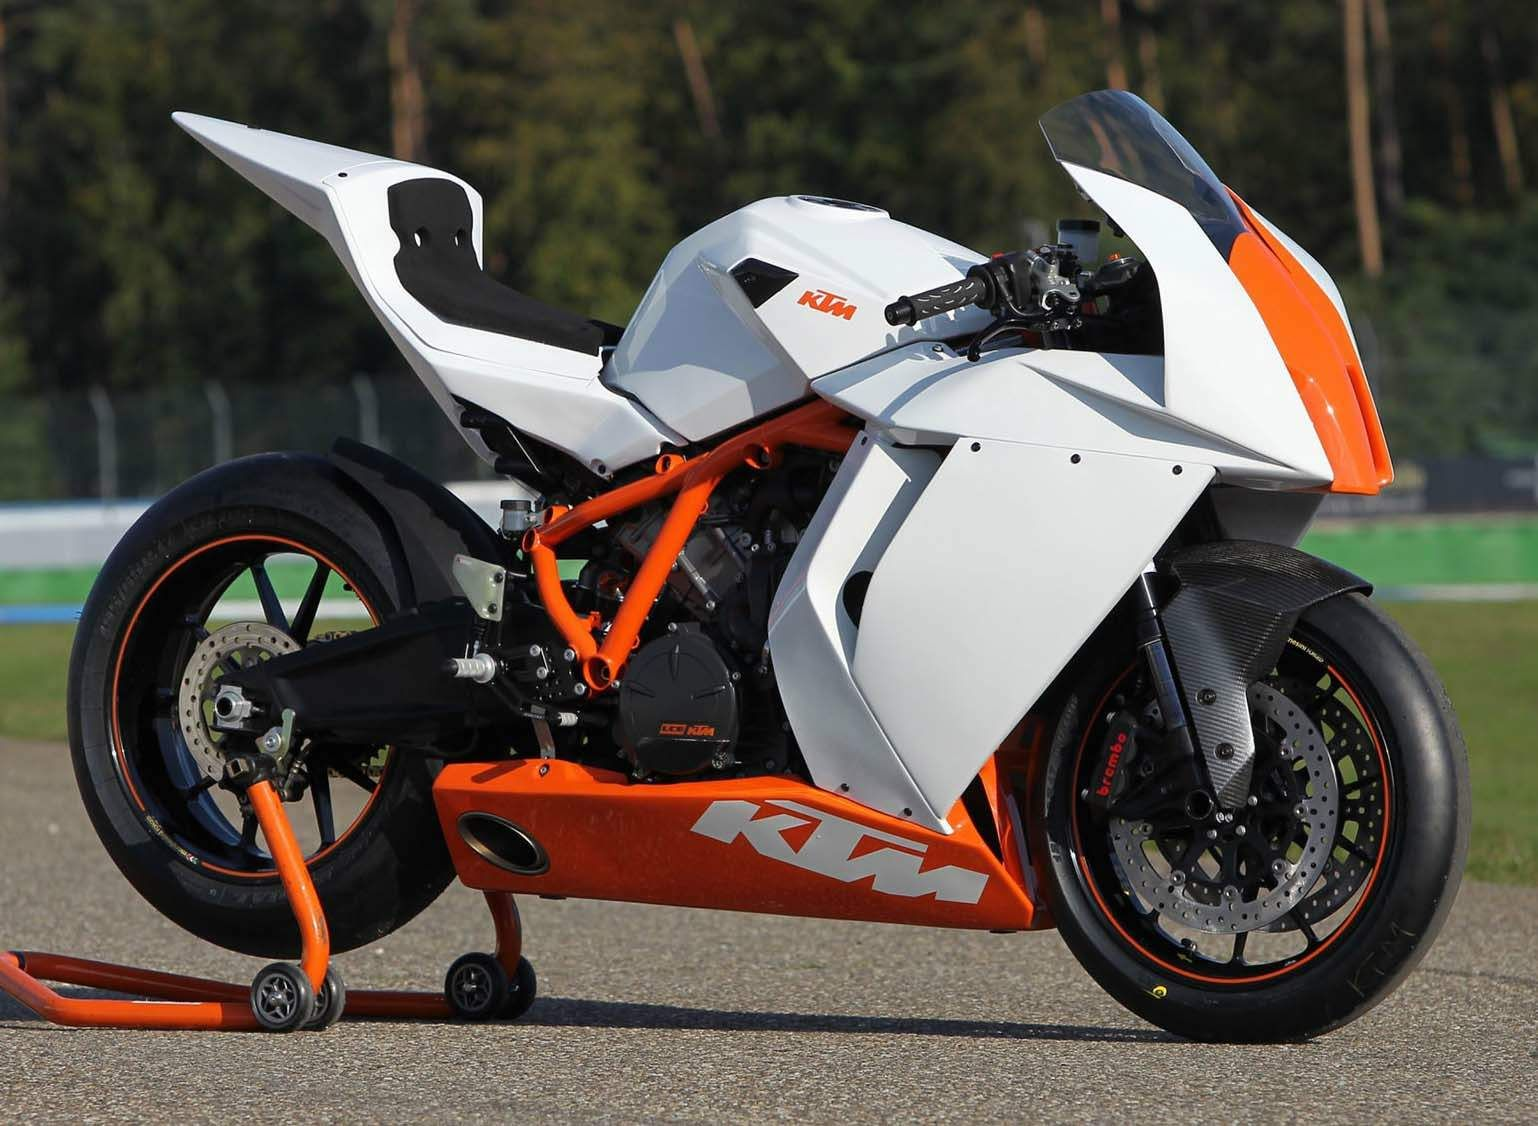 KTM RC8 R Ktm rc8, Ktm, Ktm motorcycles